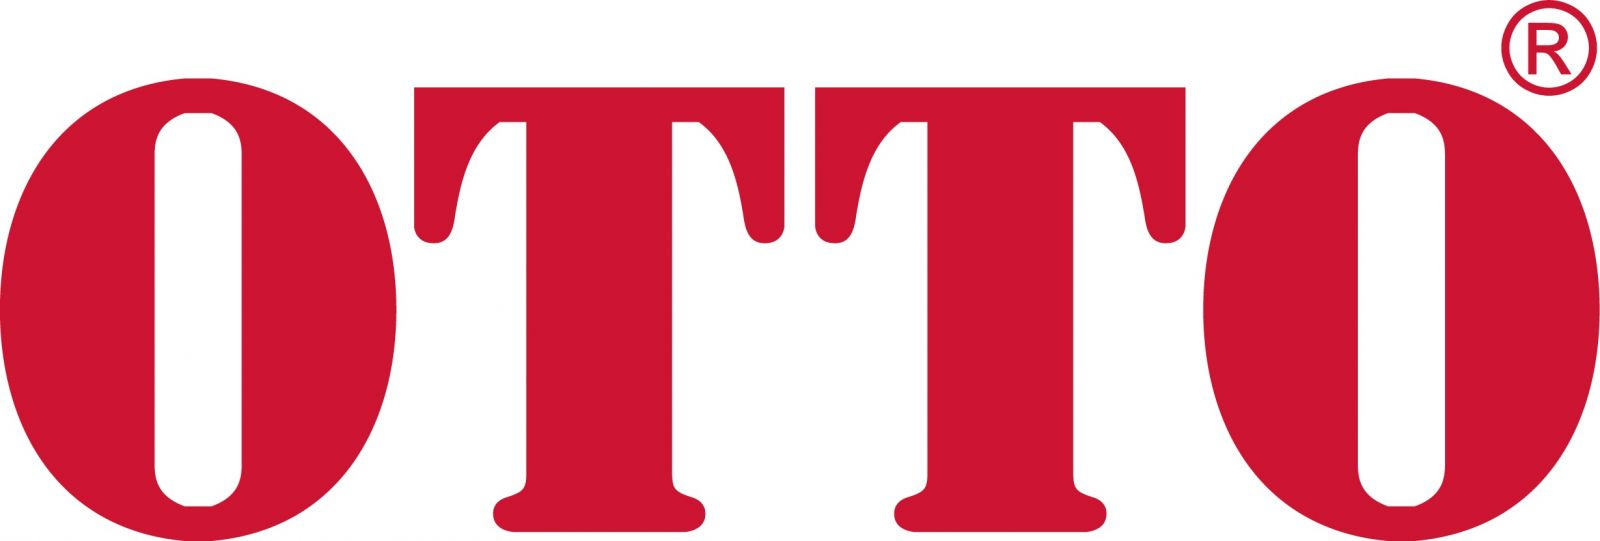 OTTO_logo_without_tagline